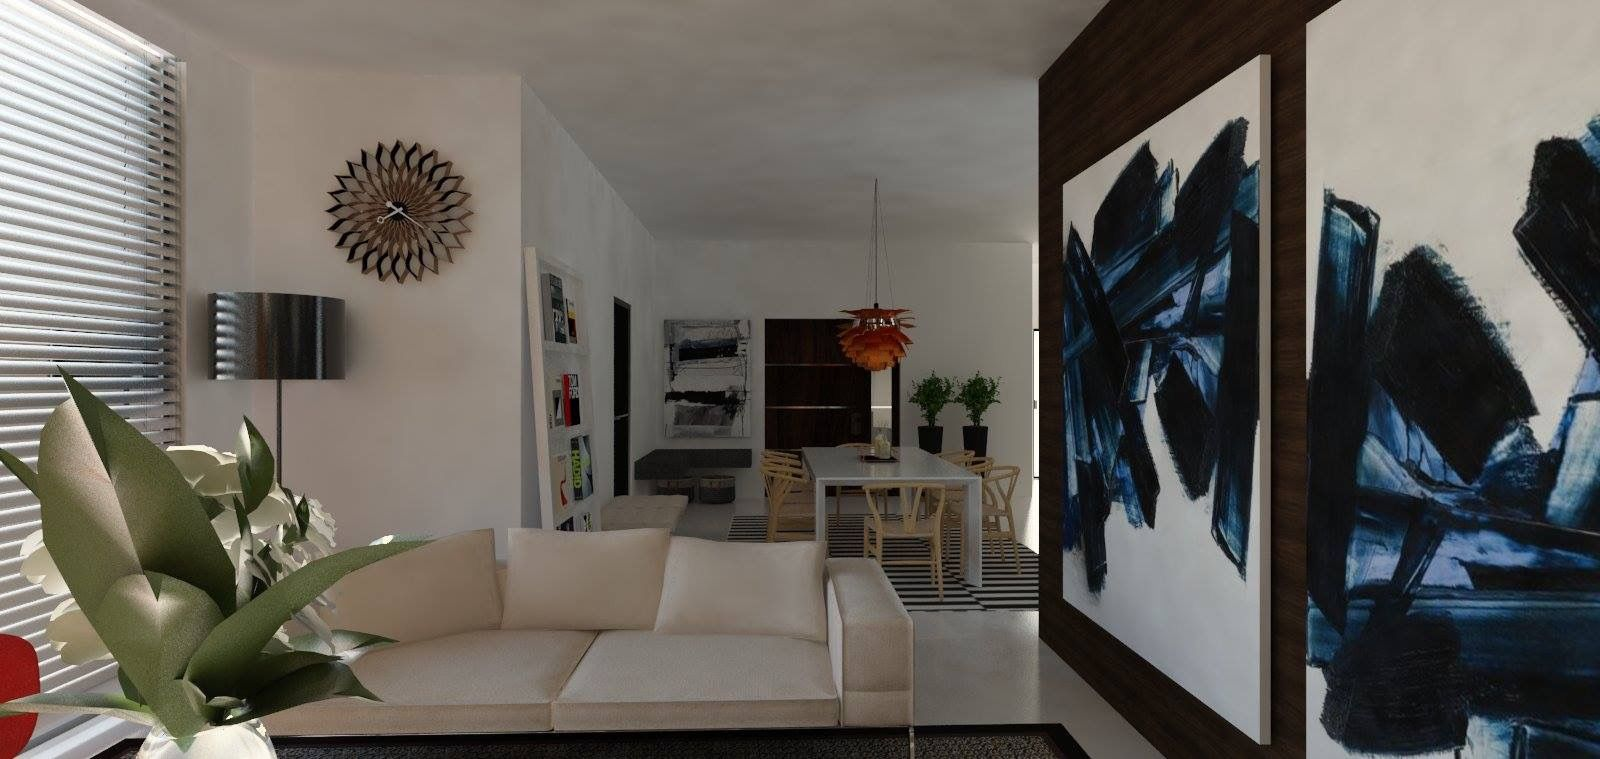 Interiors KL Gateway Premium Residences 3 Bedroom Serviced Apartment 1399sqft Bangsar South Kuala Lumpur Malaysia